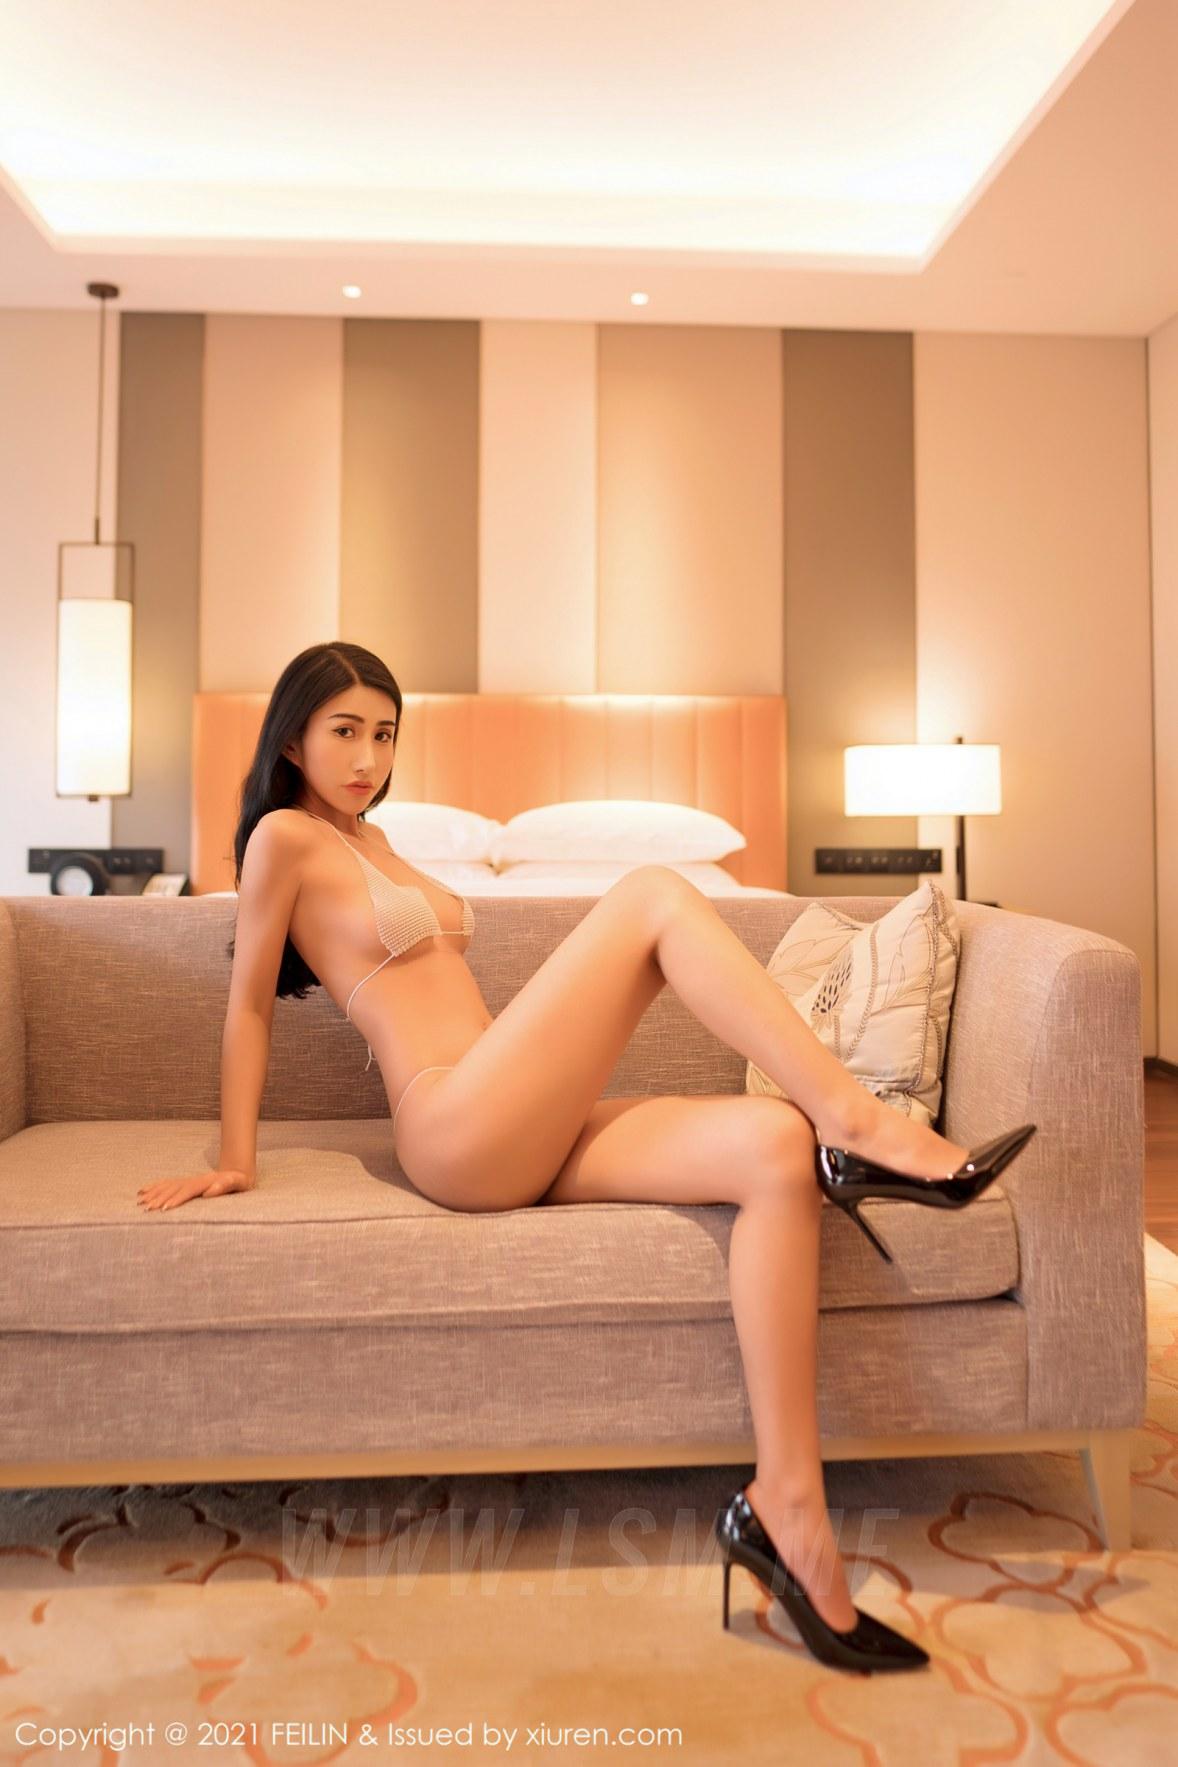 FeiLin 嗲囡囡 Vol.381 三点式内衣系列 春药儿新人模特首套写真 - 2